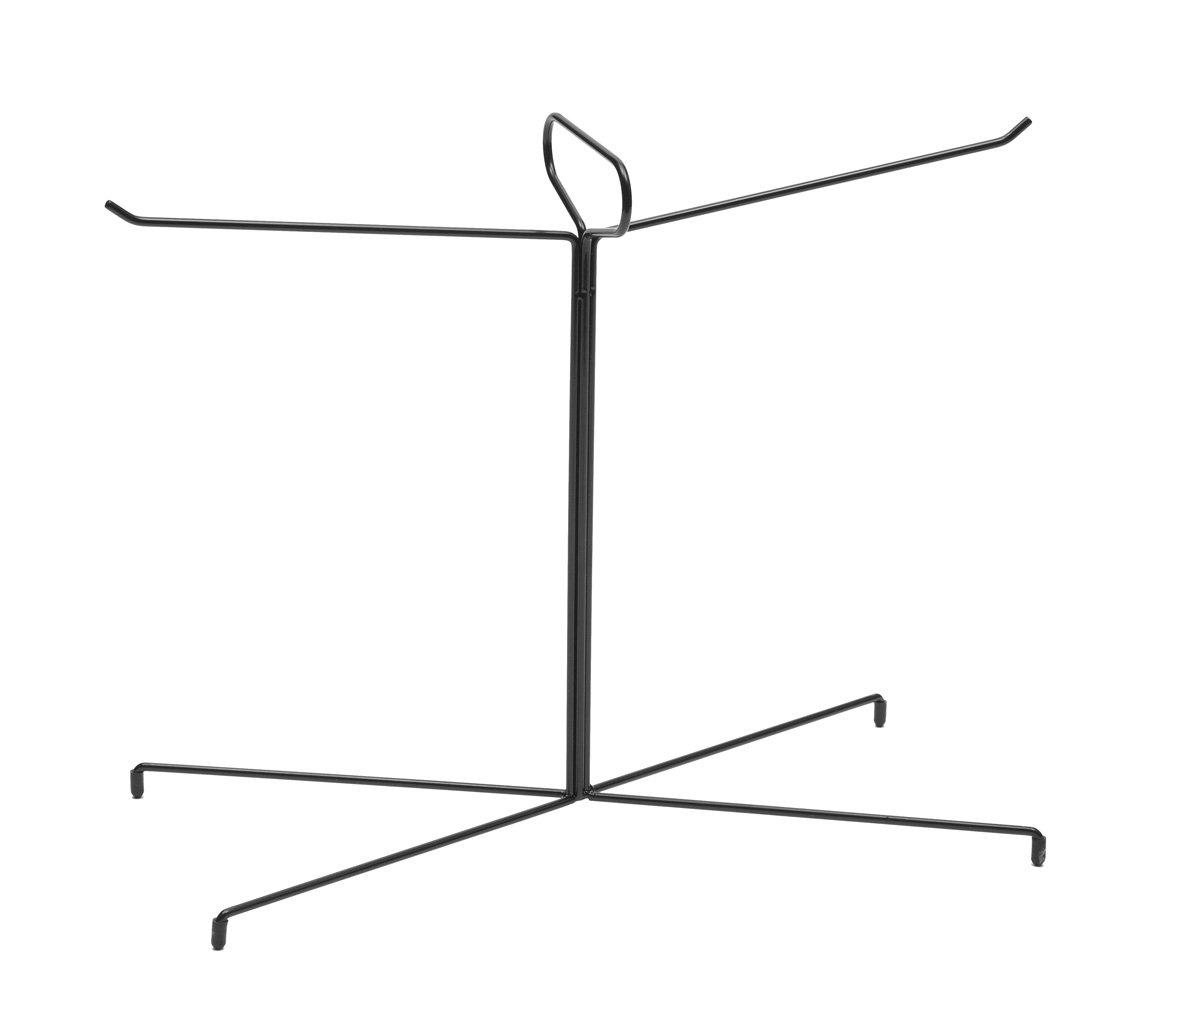 30 Quick Response Whiteboards w/ Mini Erasers & Dry Erase Board Hanging Rack